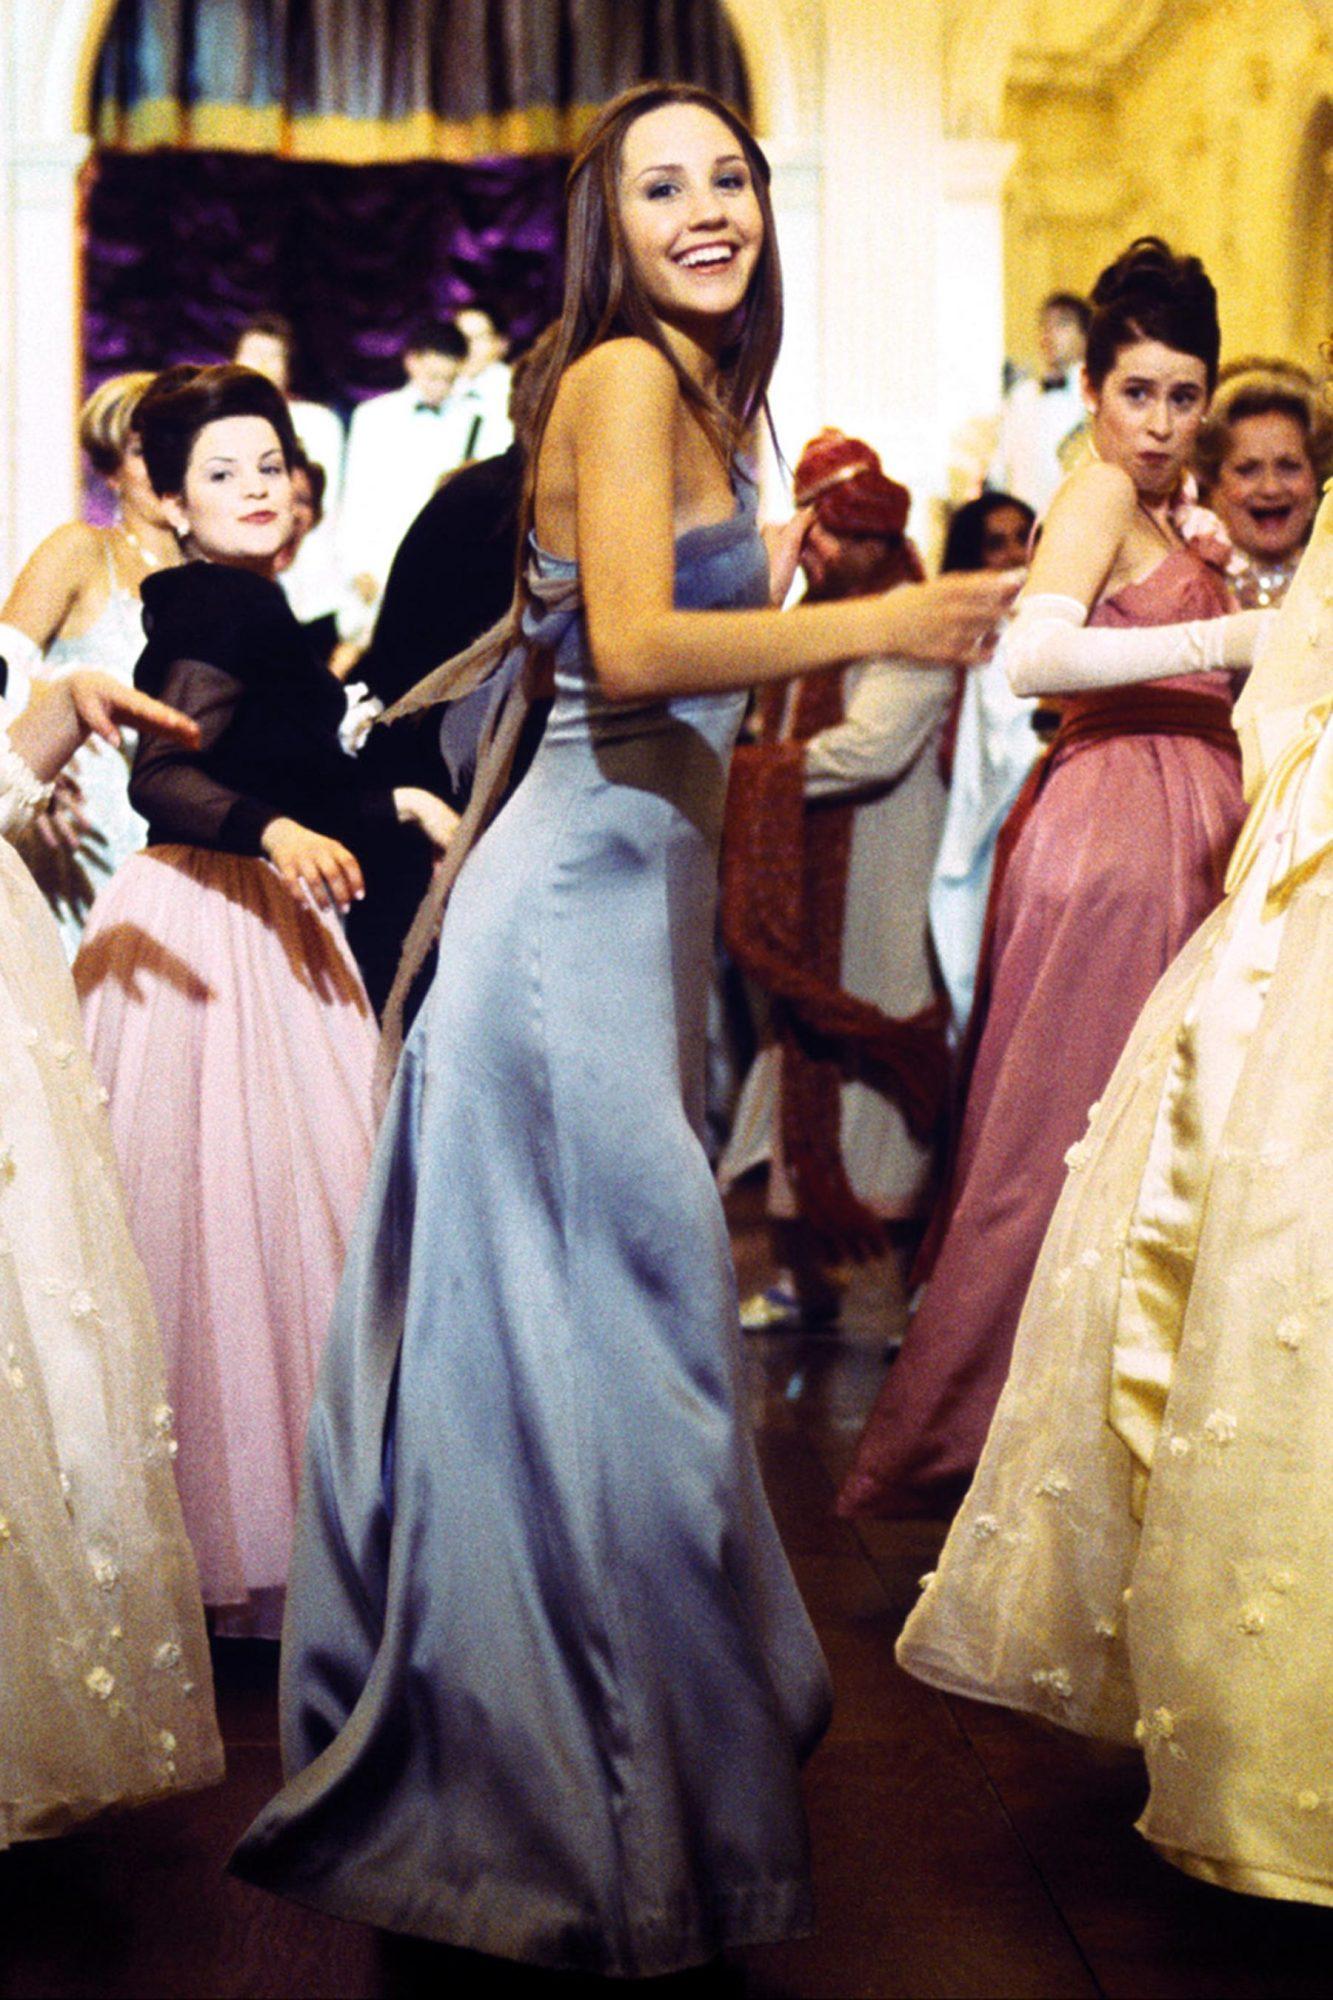 WHAT A GIRL WANTS, Cassie Powney, Amanda Bynes, Connie Powney, 2003, (c) Warner Brothers/courtesy Ev